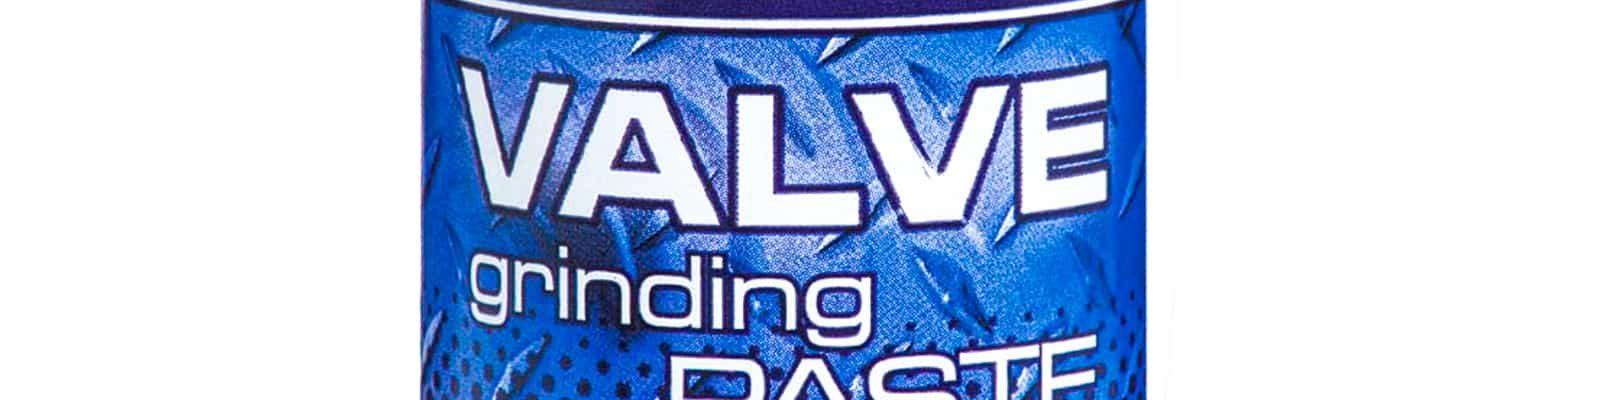 Valve Grinding Paste